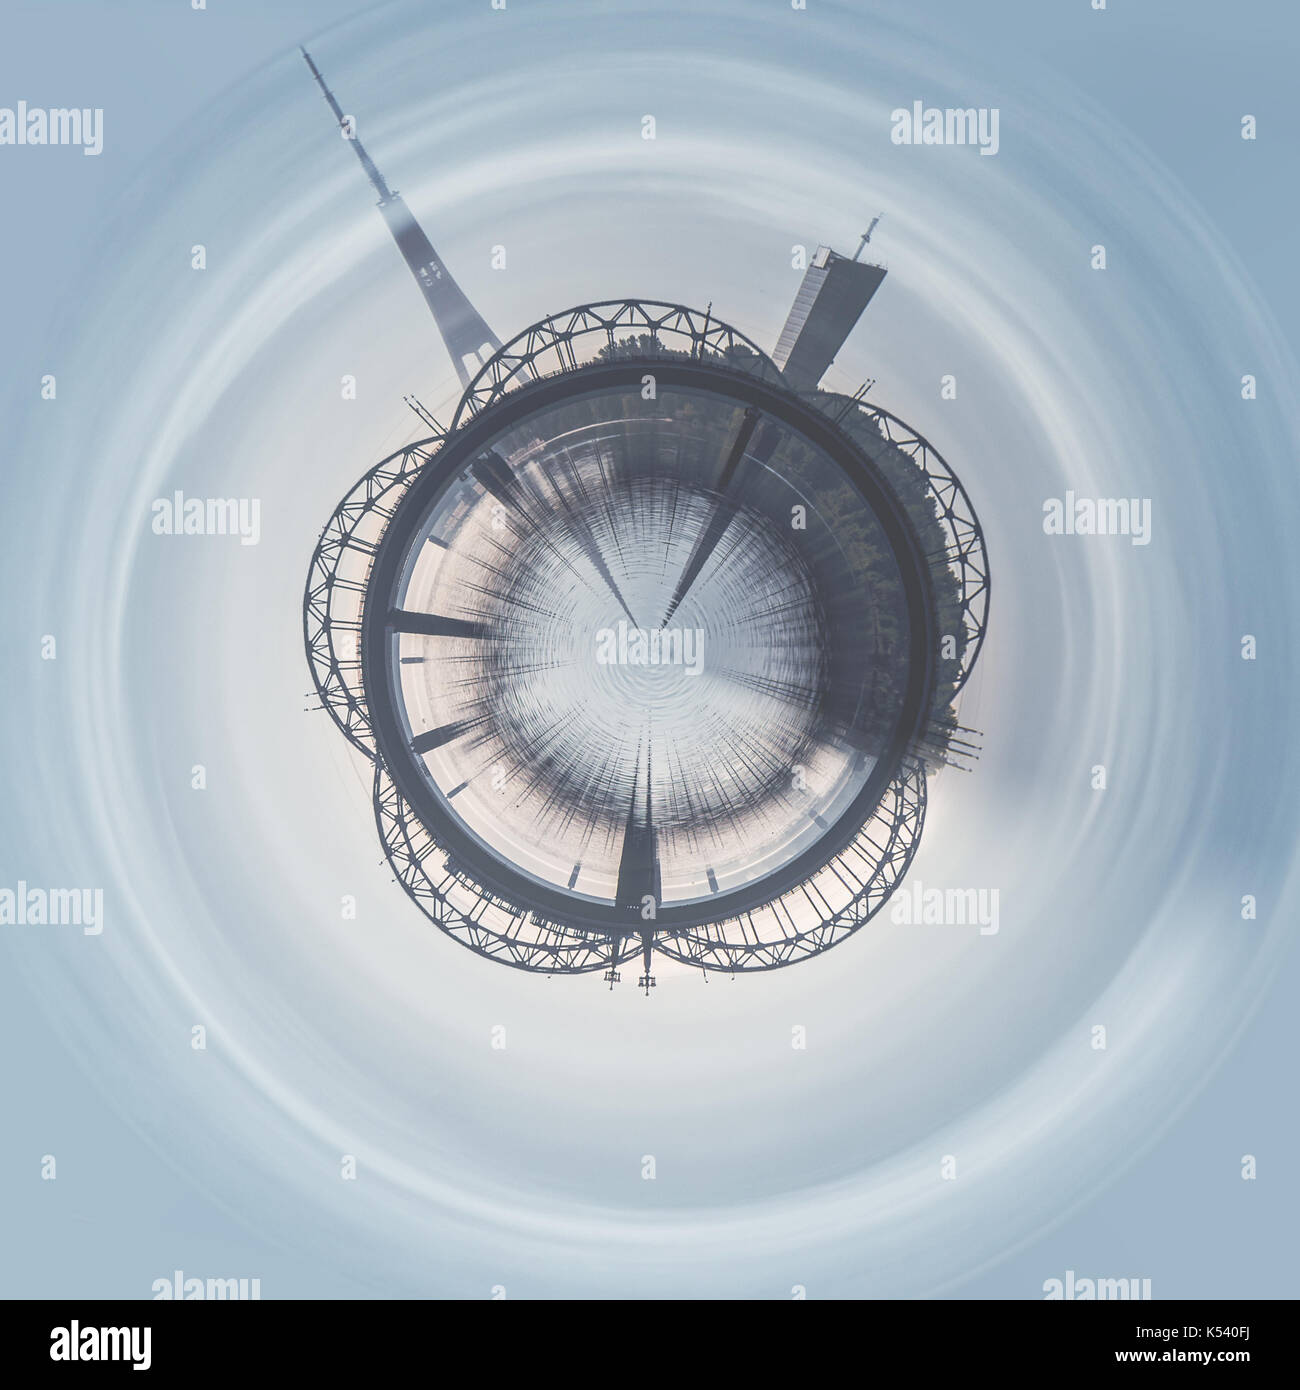 Little planet 360 degree sphere. Panoramic view of Railway bridge in the Riga city. Latvia - Stock Image